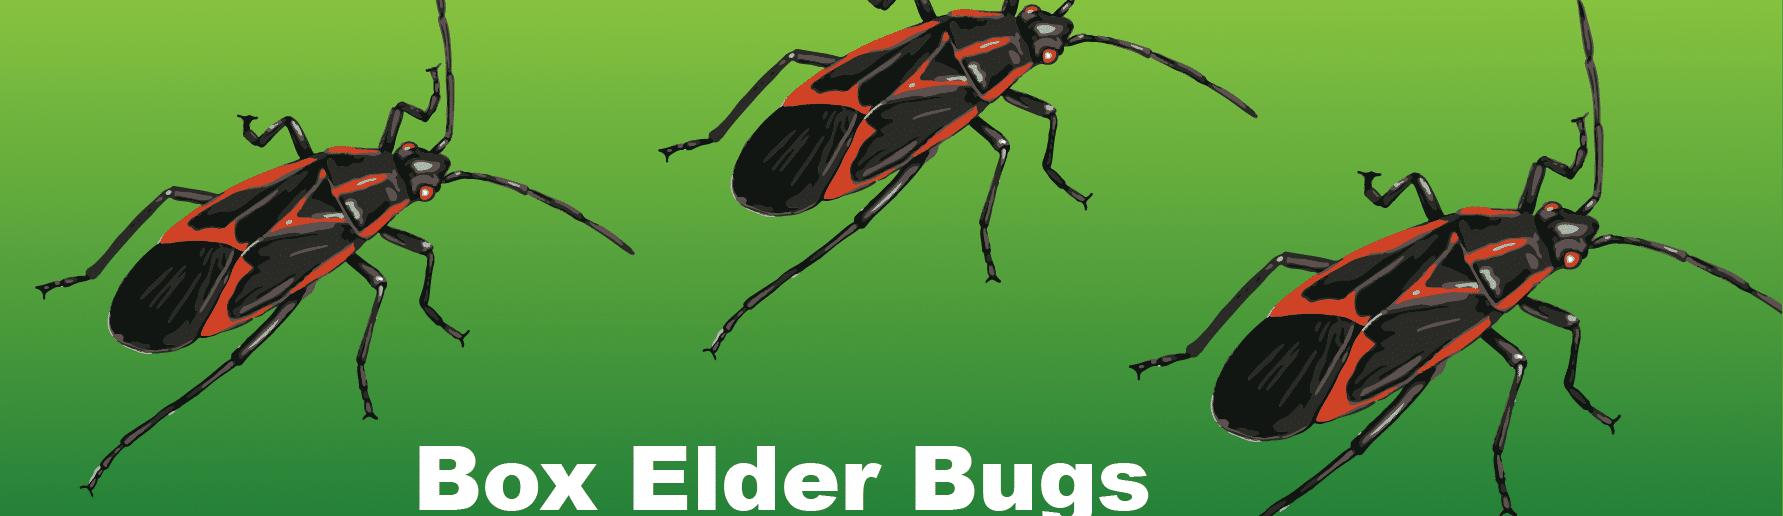 box elder bugs infographic header